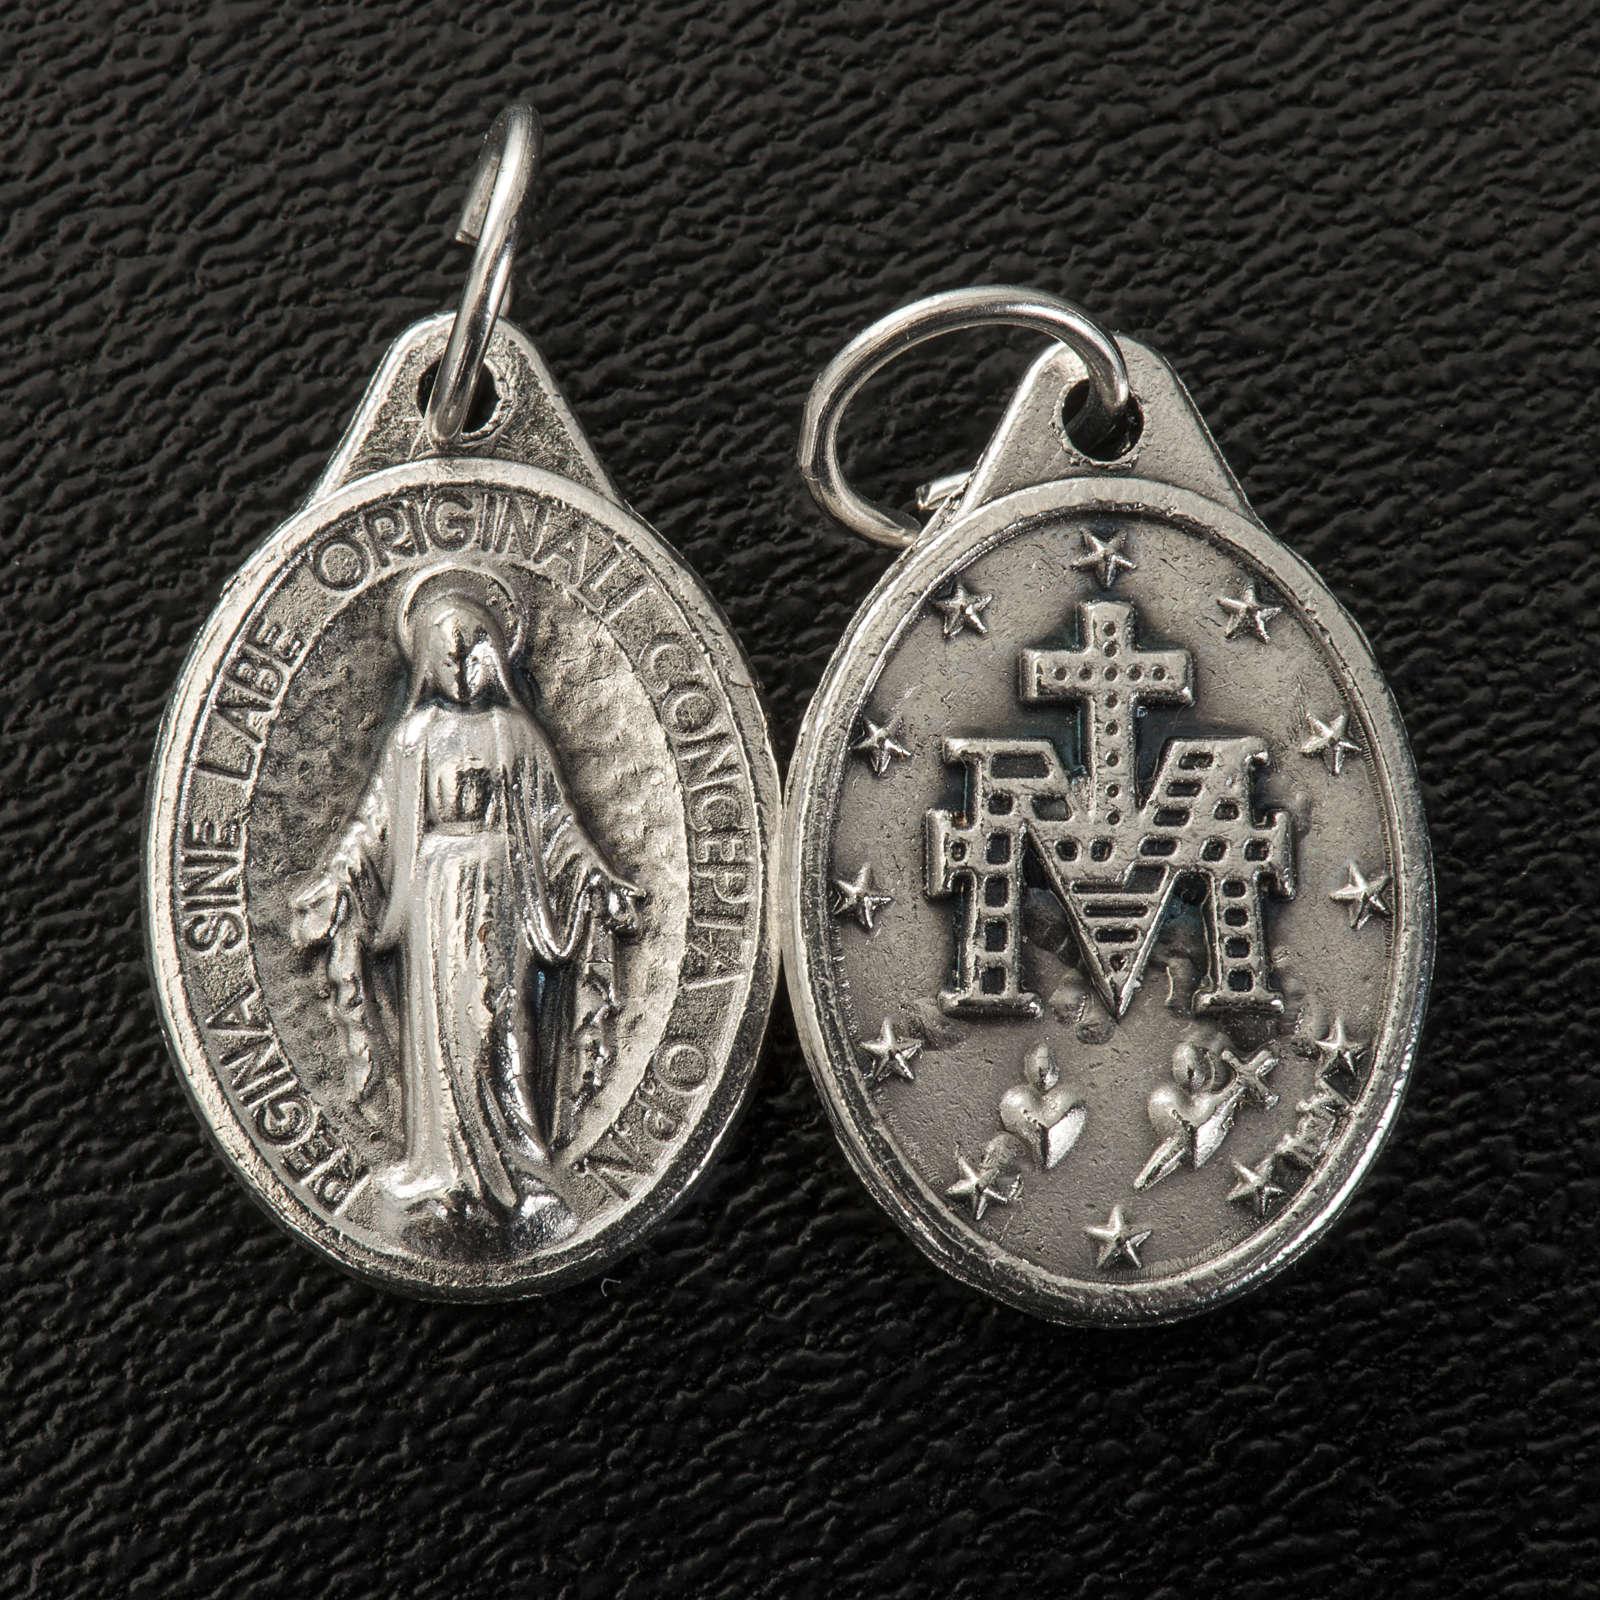 Medalla Milagrosa  forma oval metal plateado 17mm 4